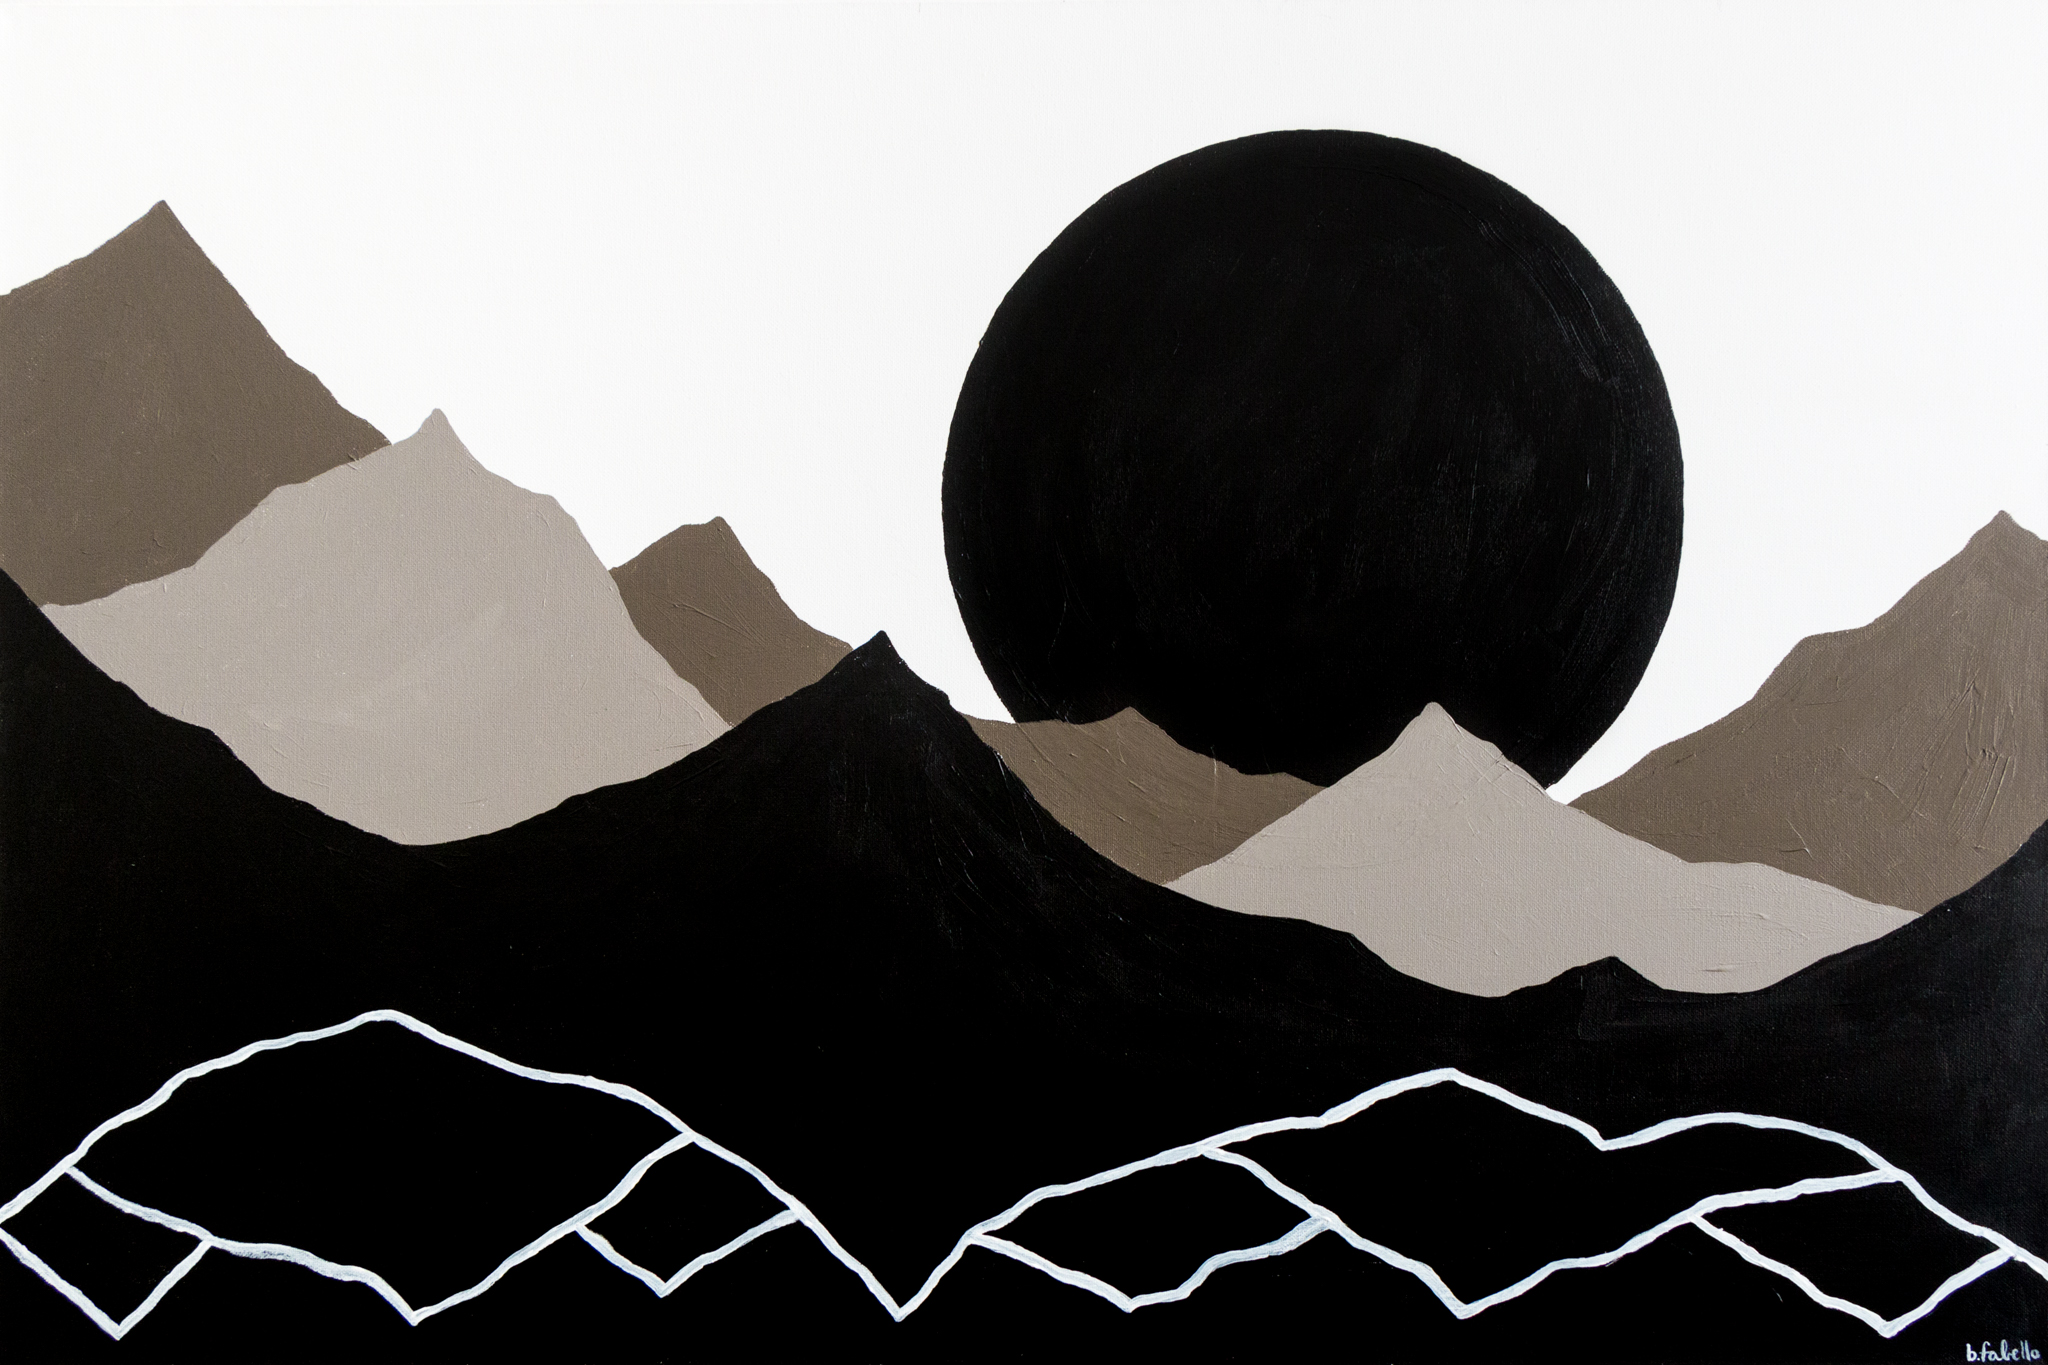 Reflection VII by Britt Fabello